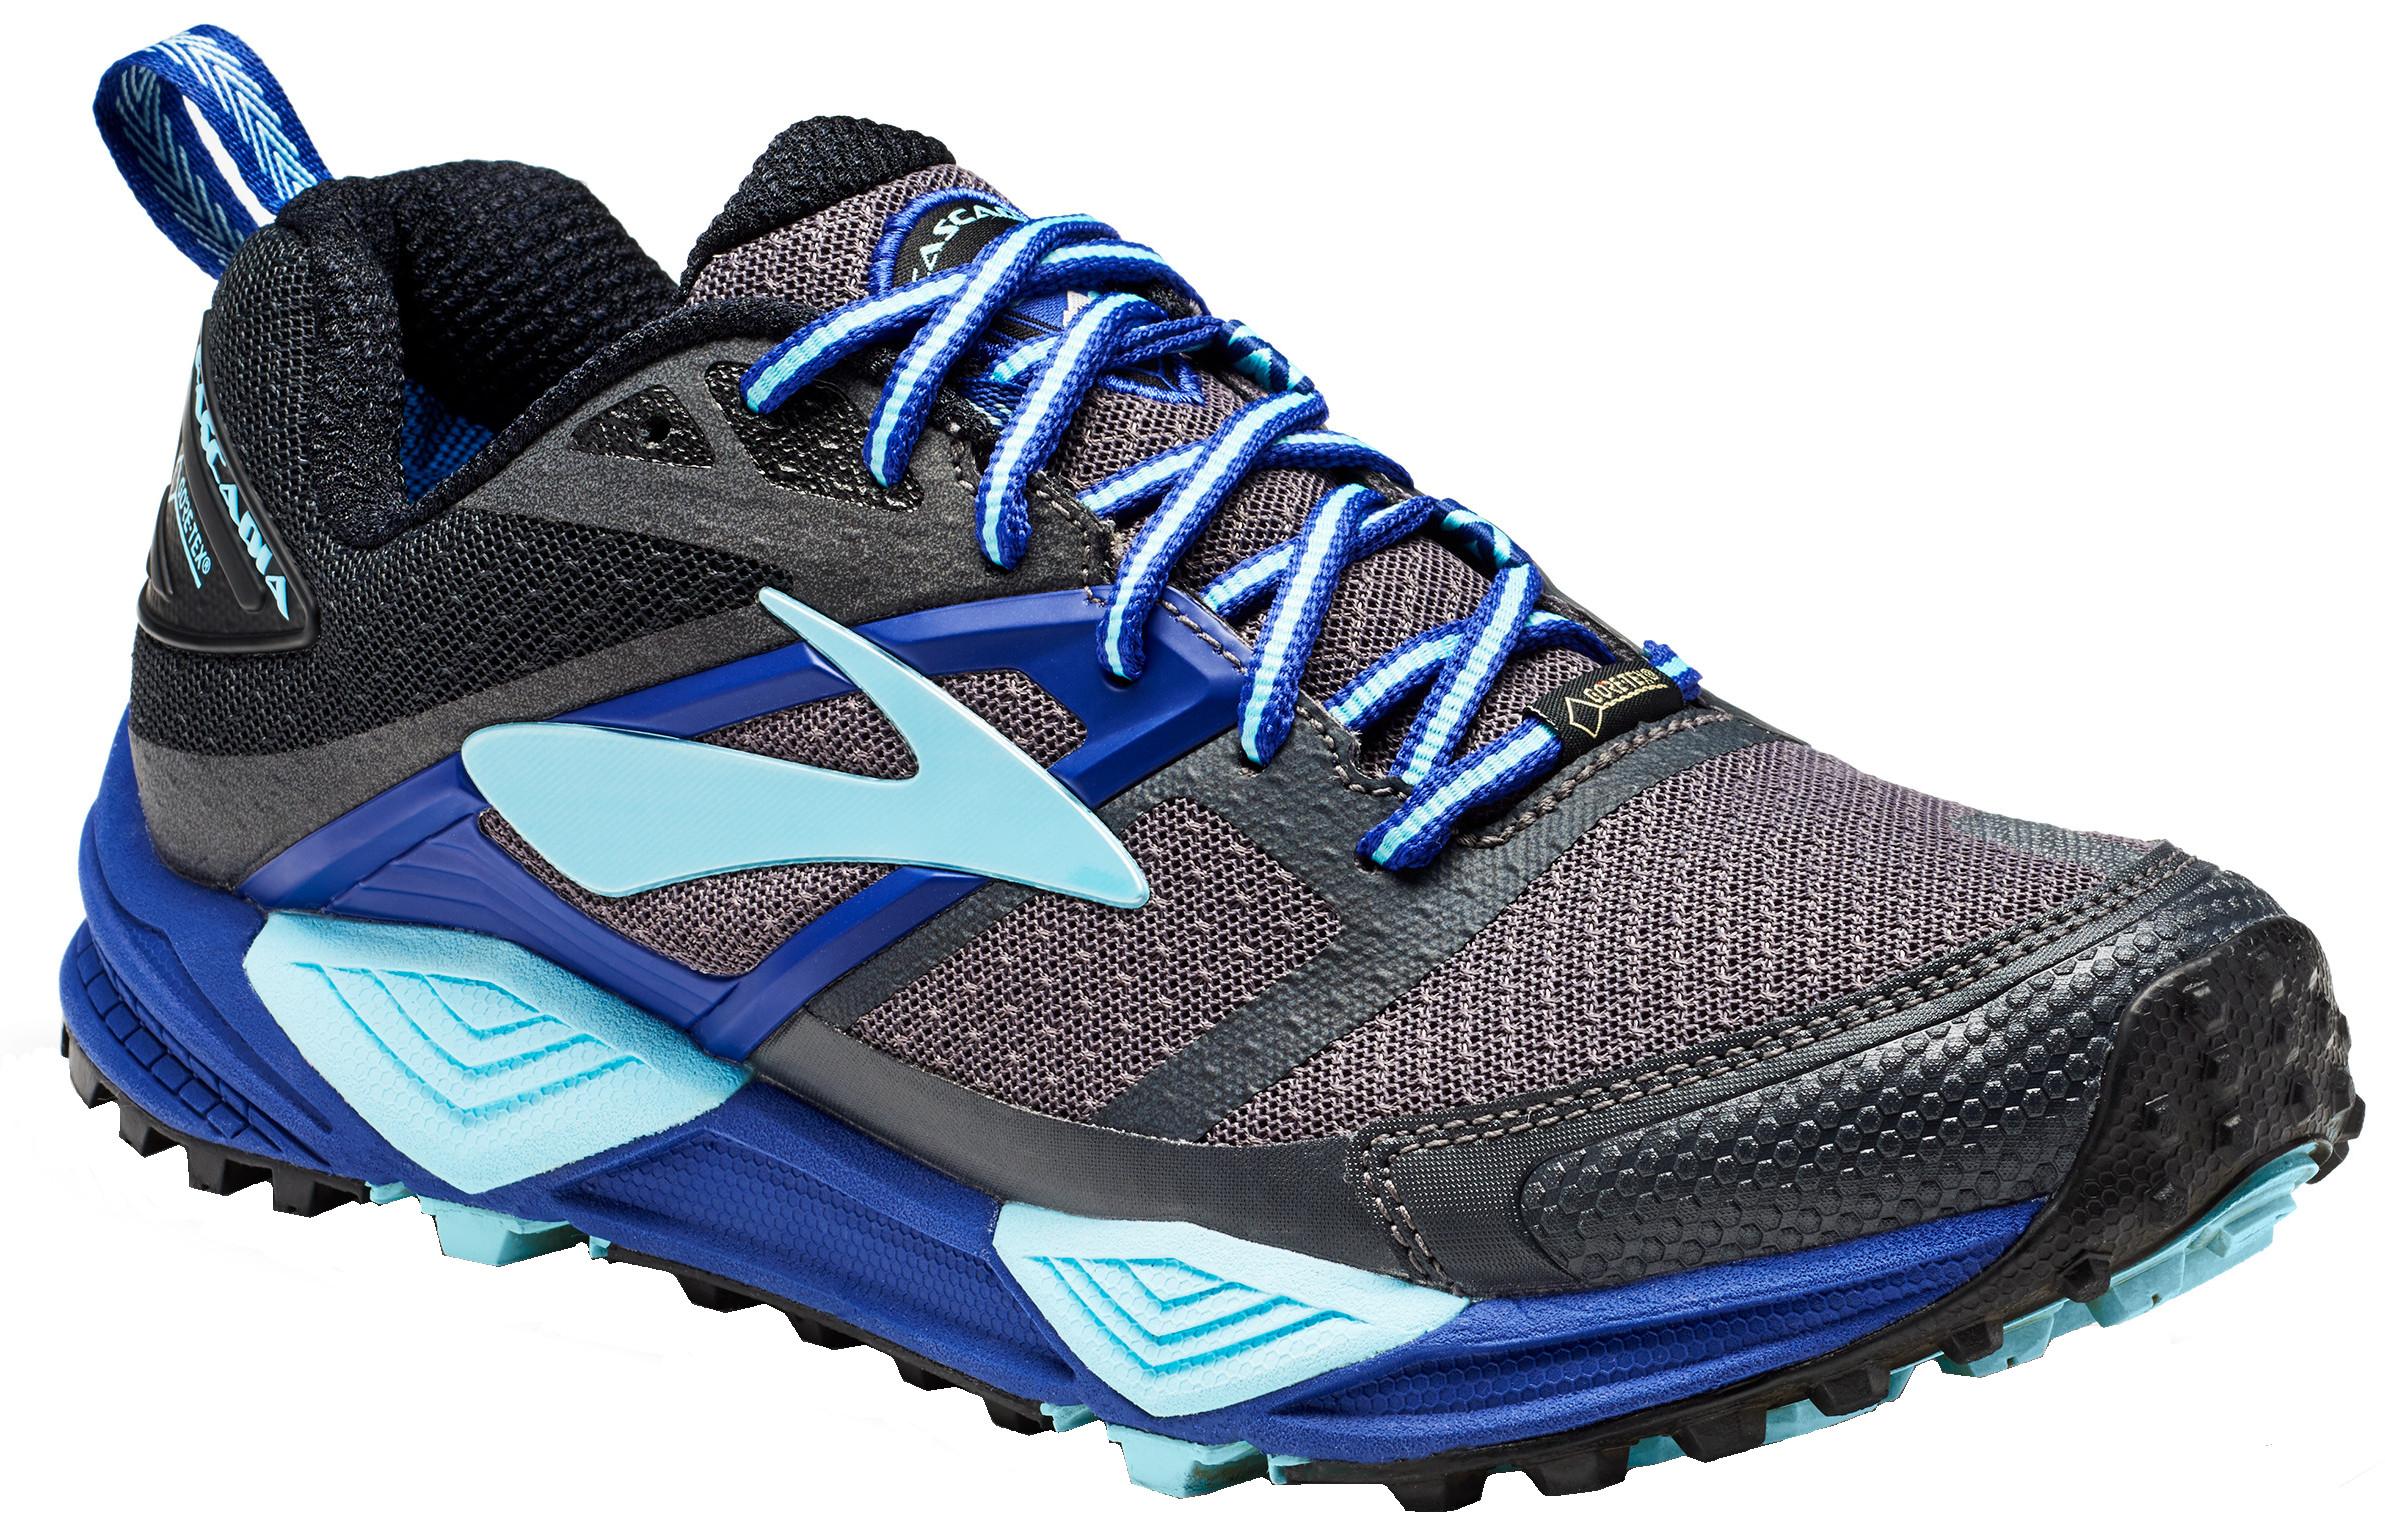 e1f73b363cc Brooks Cascadia 12 GTX Trail Running Shoe - Women s 1202521B025.060 ...